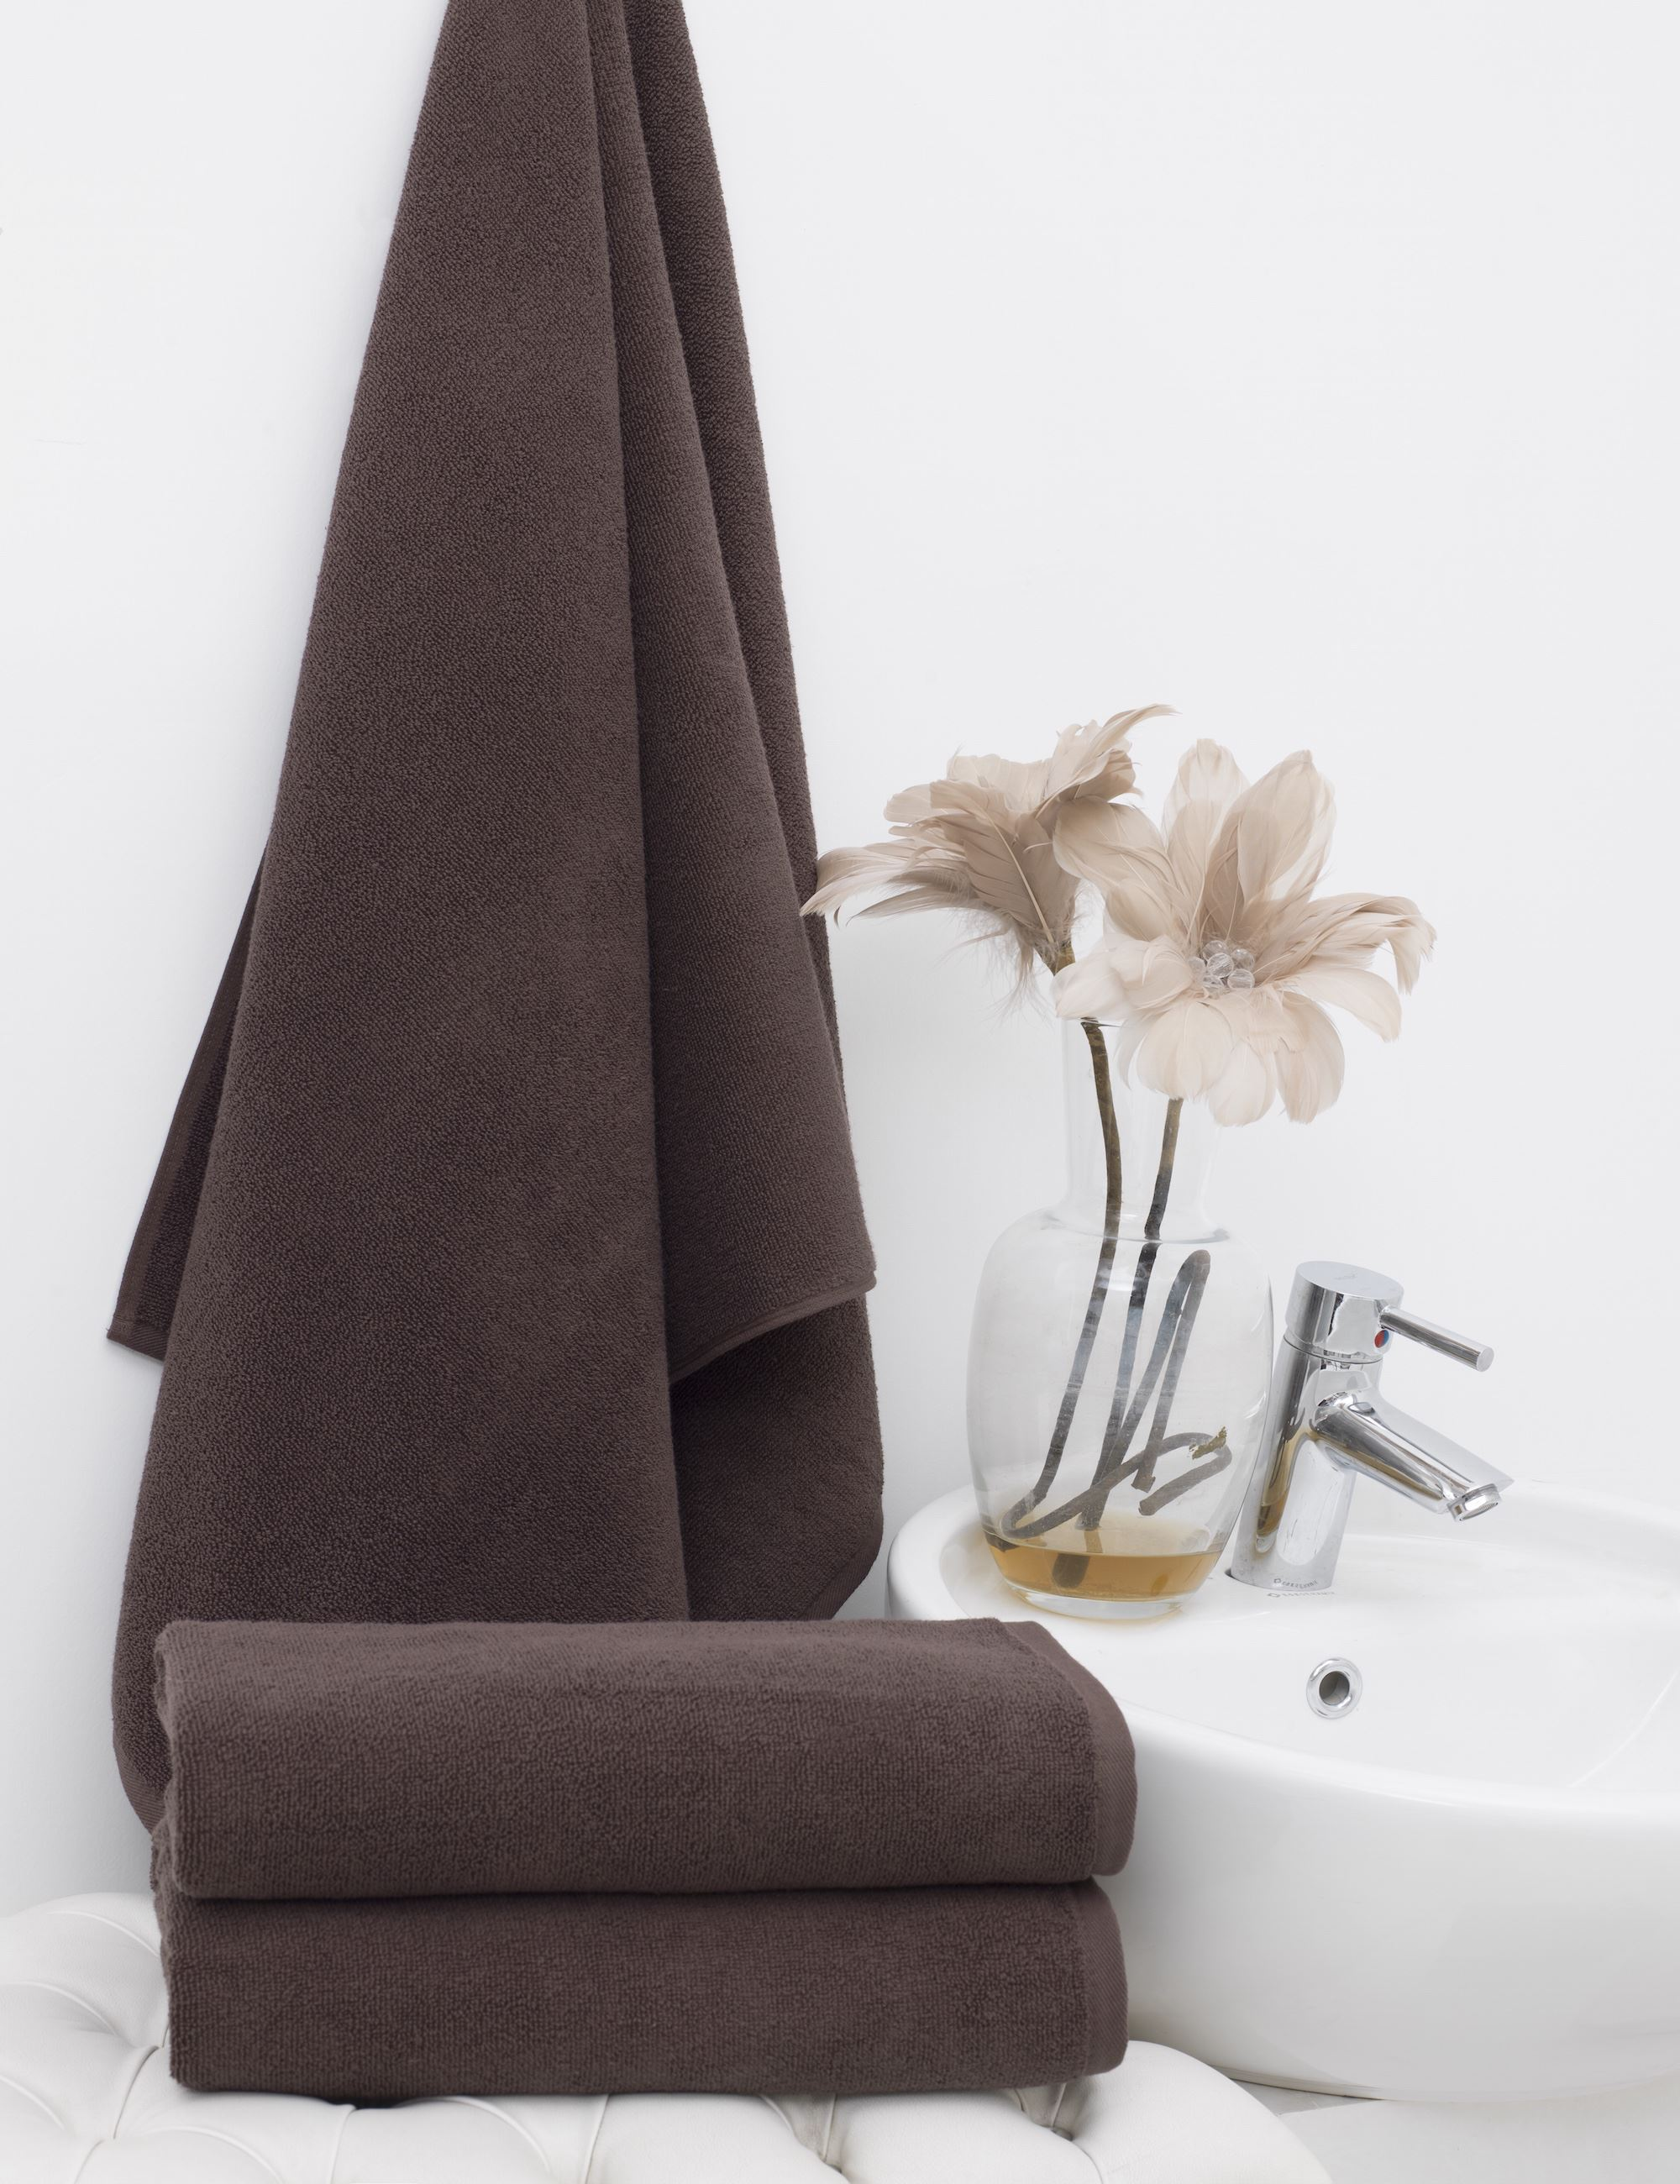 Полотенца Philippus Полотенце Vizyon Цвет: Шоколадный (50х90 см - 12 шт) полотенца philippus полотенце vizyon цвет шоколадный 50х90 см 12 шт